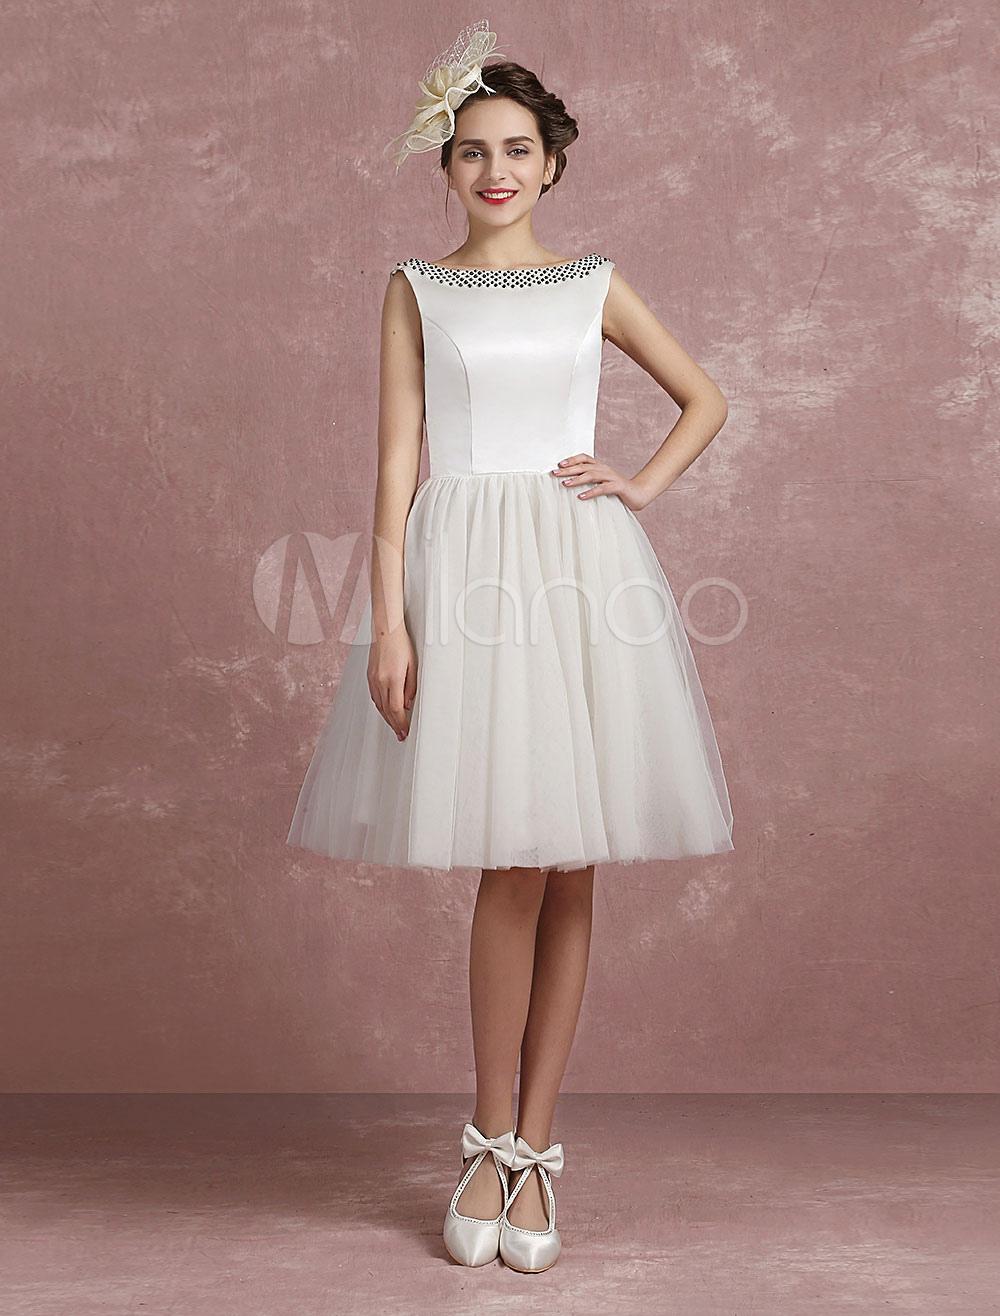 Short Wedding Dress Bateau Beading Tulle A-Line Knee-Length Bridal Dress photo